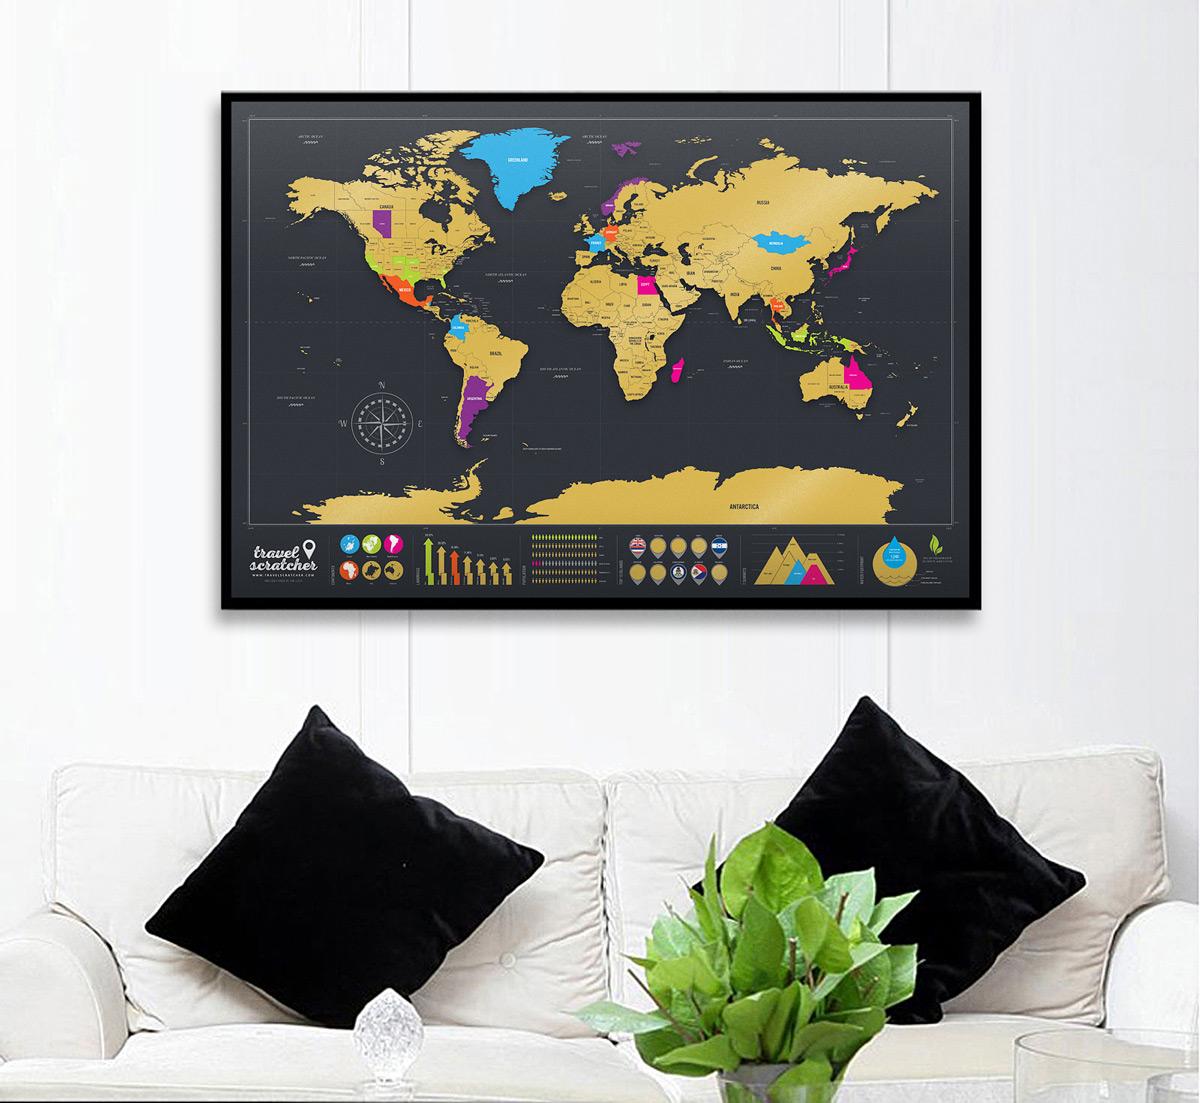 Travelscratcher scratch off world map dudeiwantthat travelscratcher scratch off world map gumiabroncs Choice Image